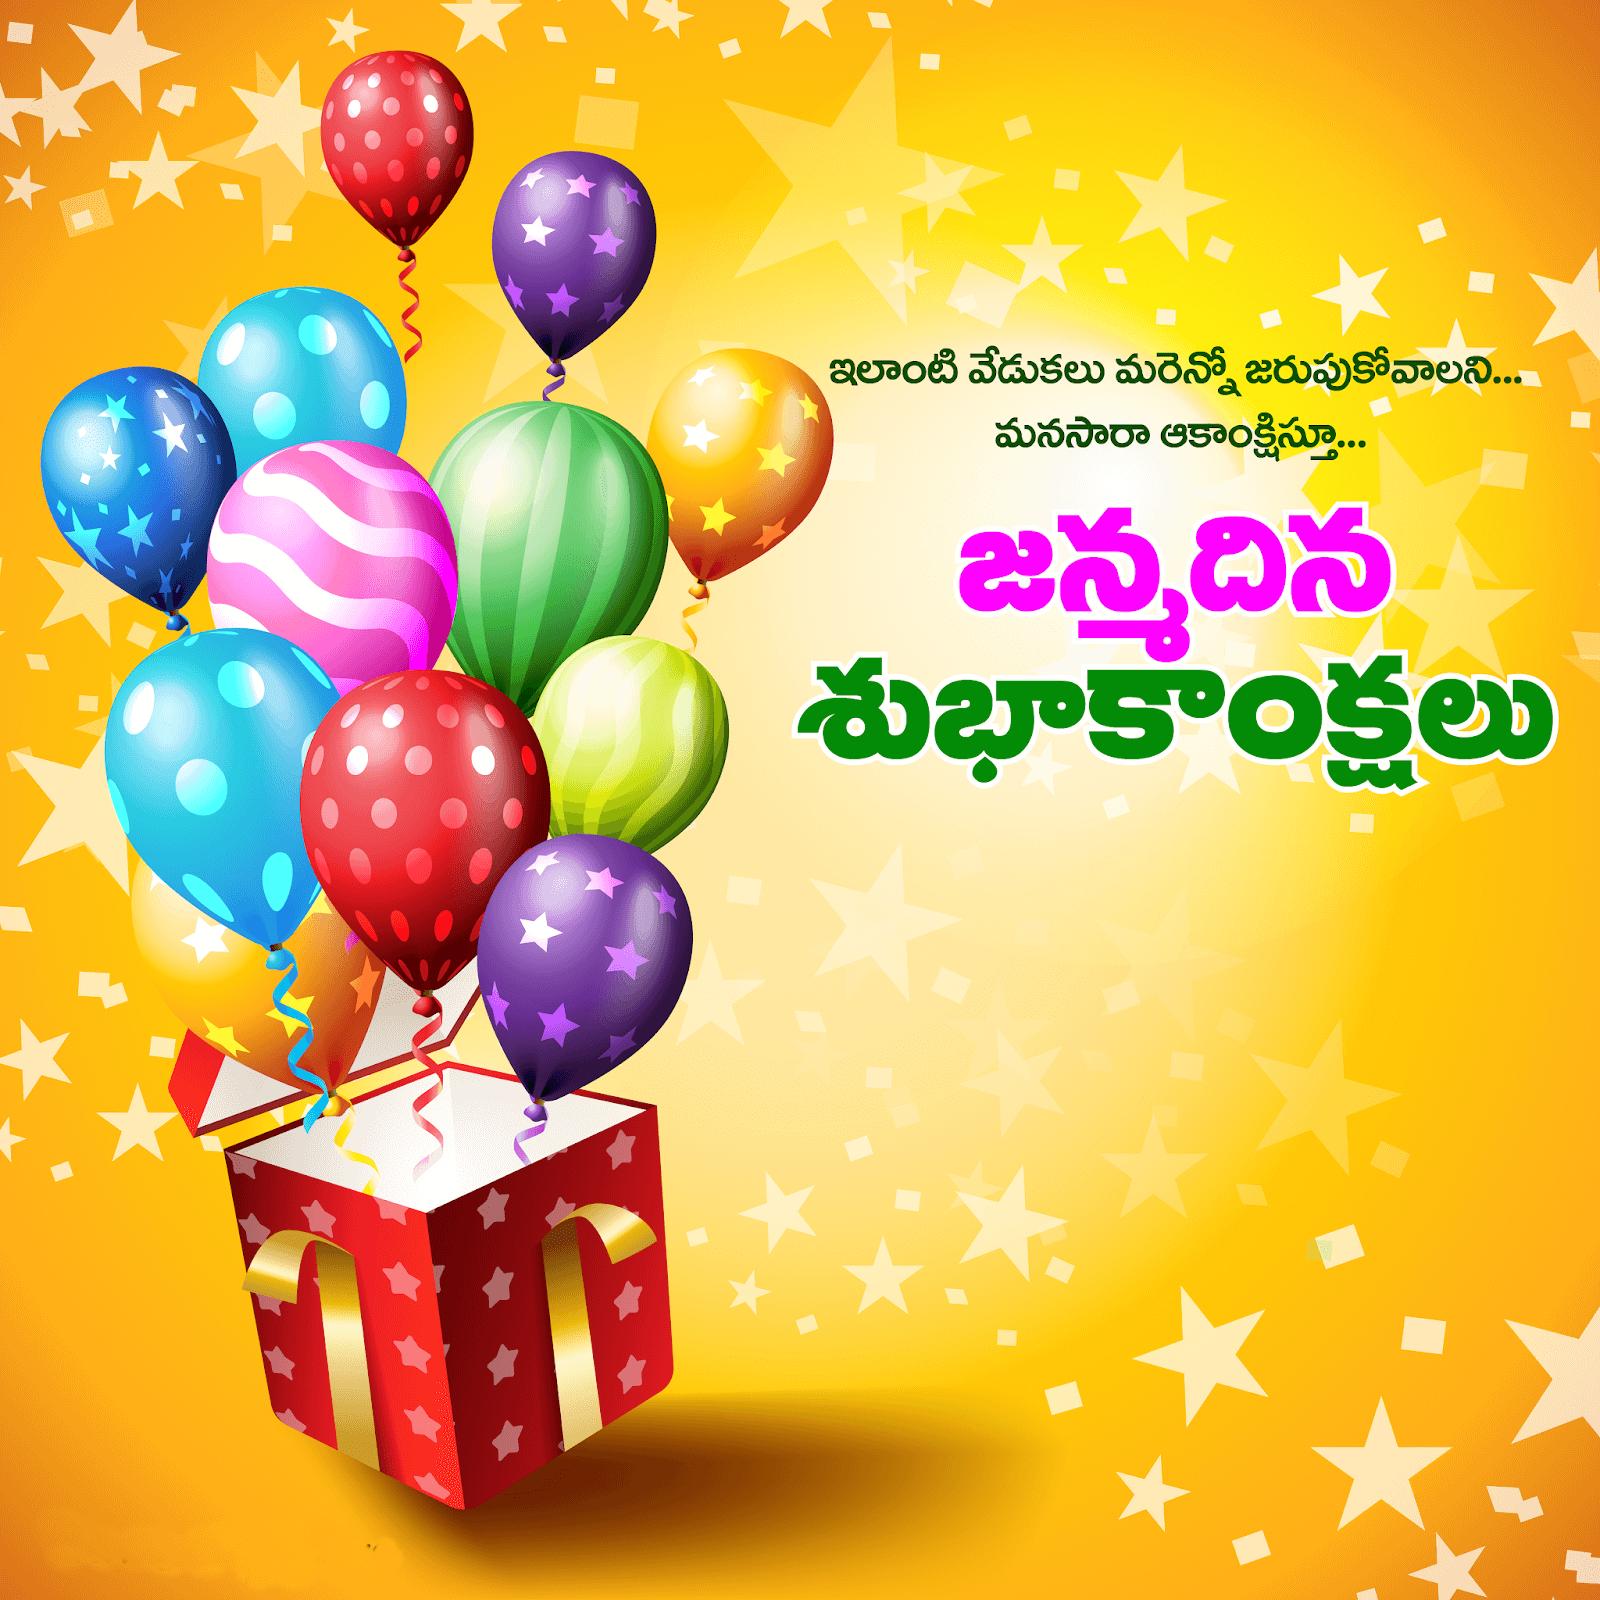 Happy Birthday Wishes In Telugu Balloons